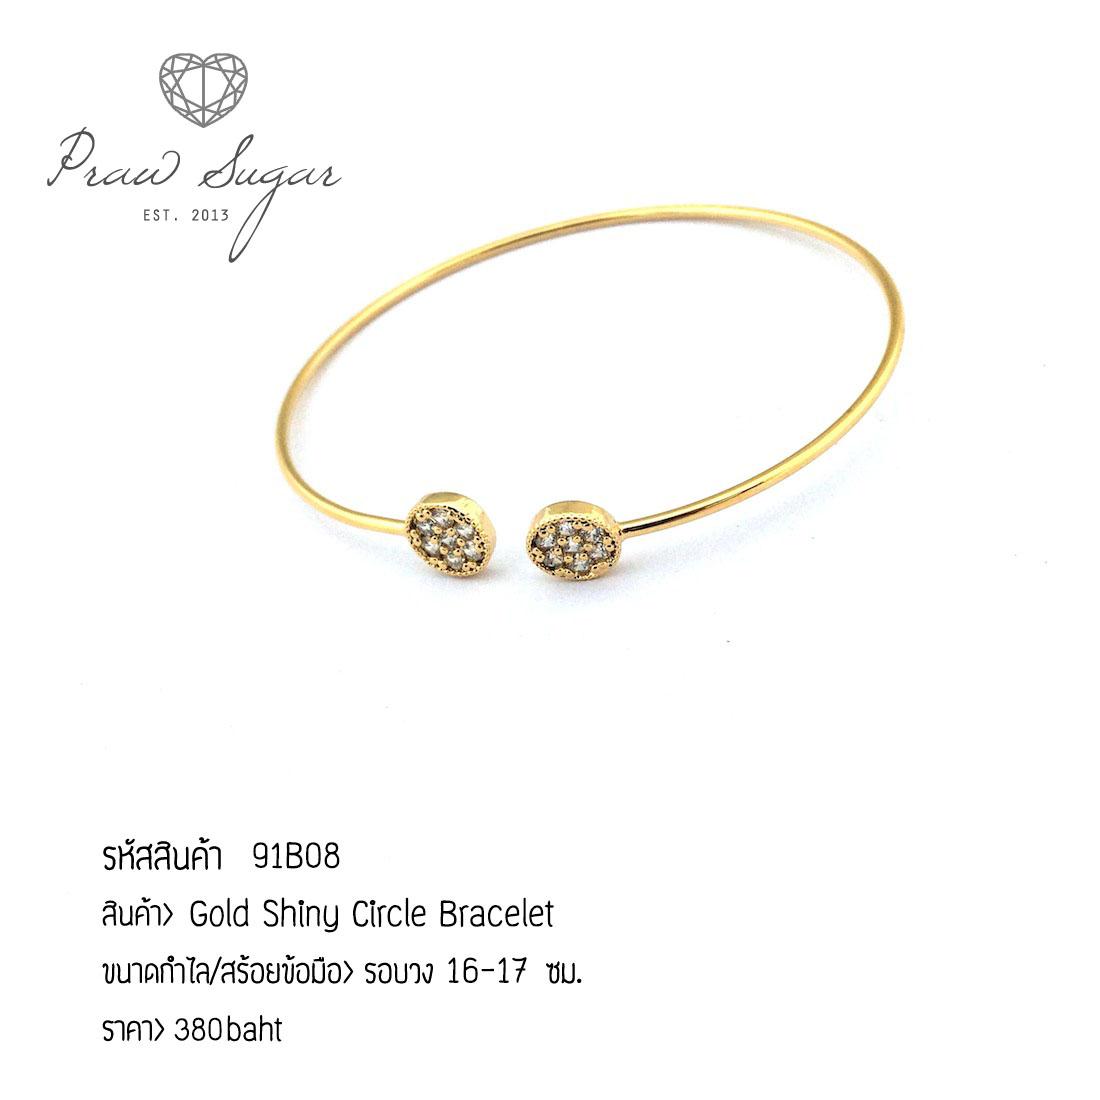 Gold Shiny Circle Bracelet